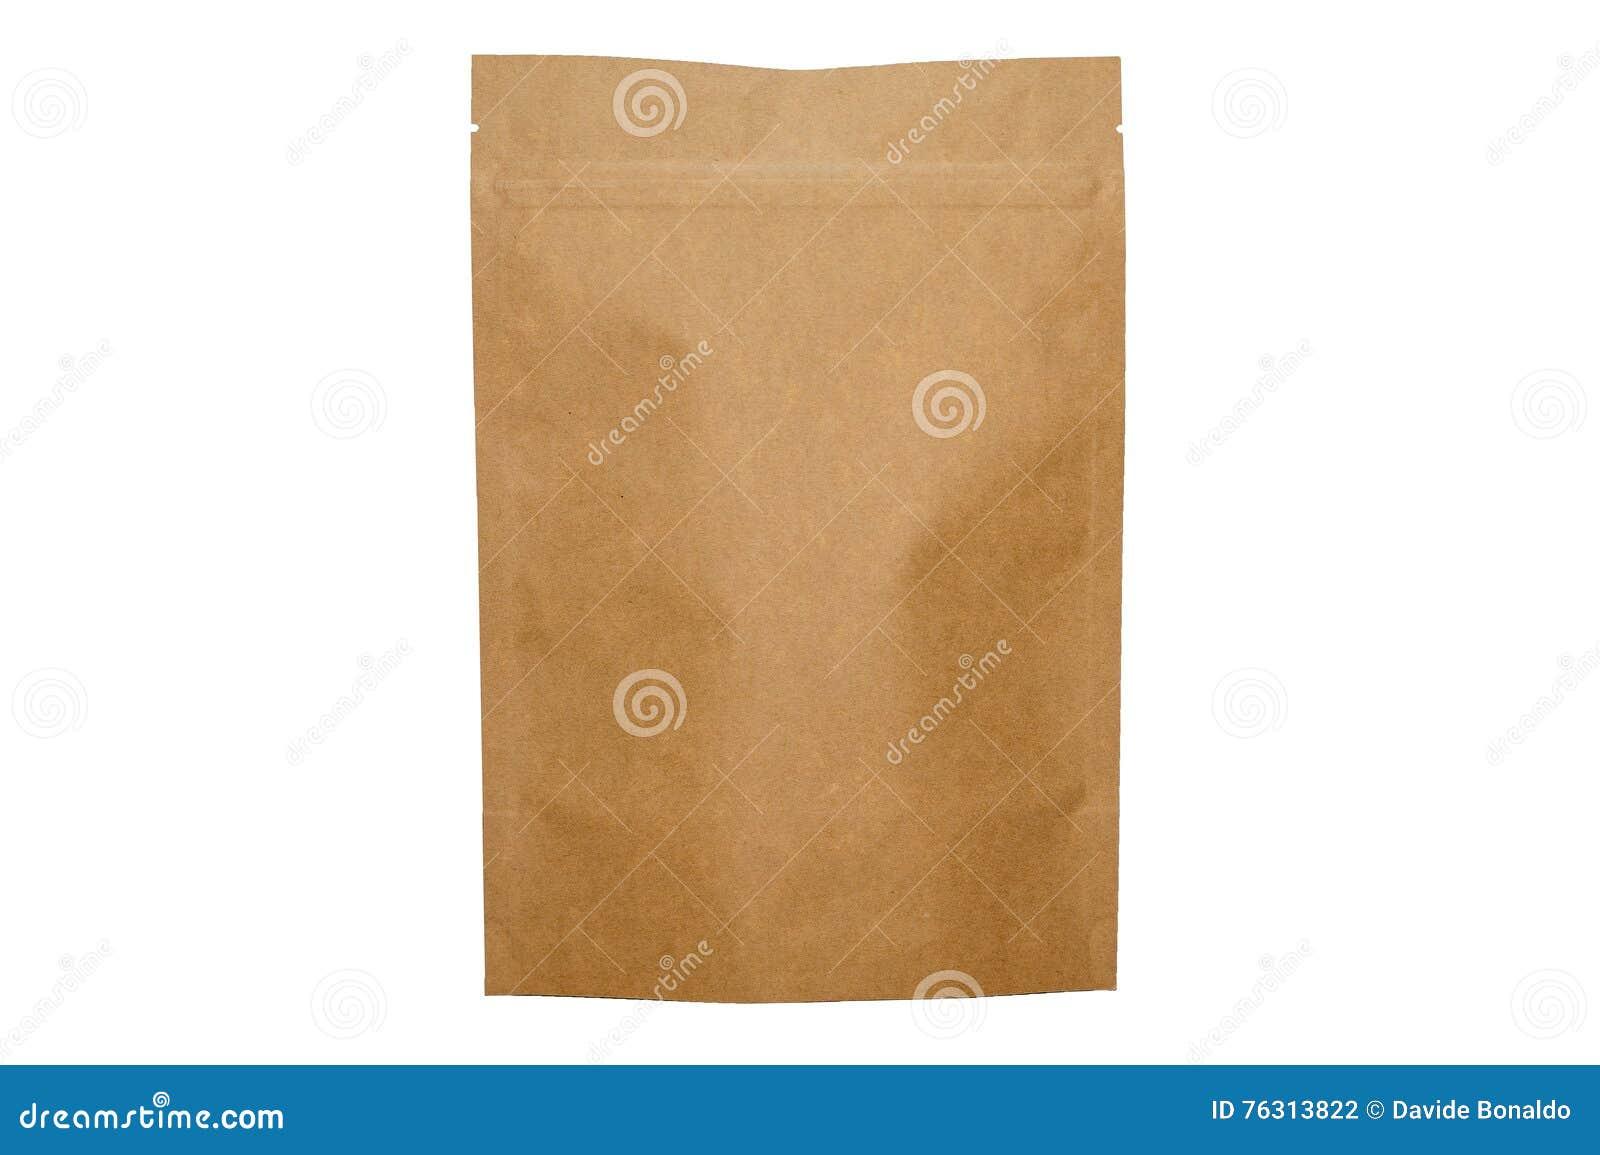 Kraftpapier-document doypack zak met ritssluiting op witte achtergrond